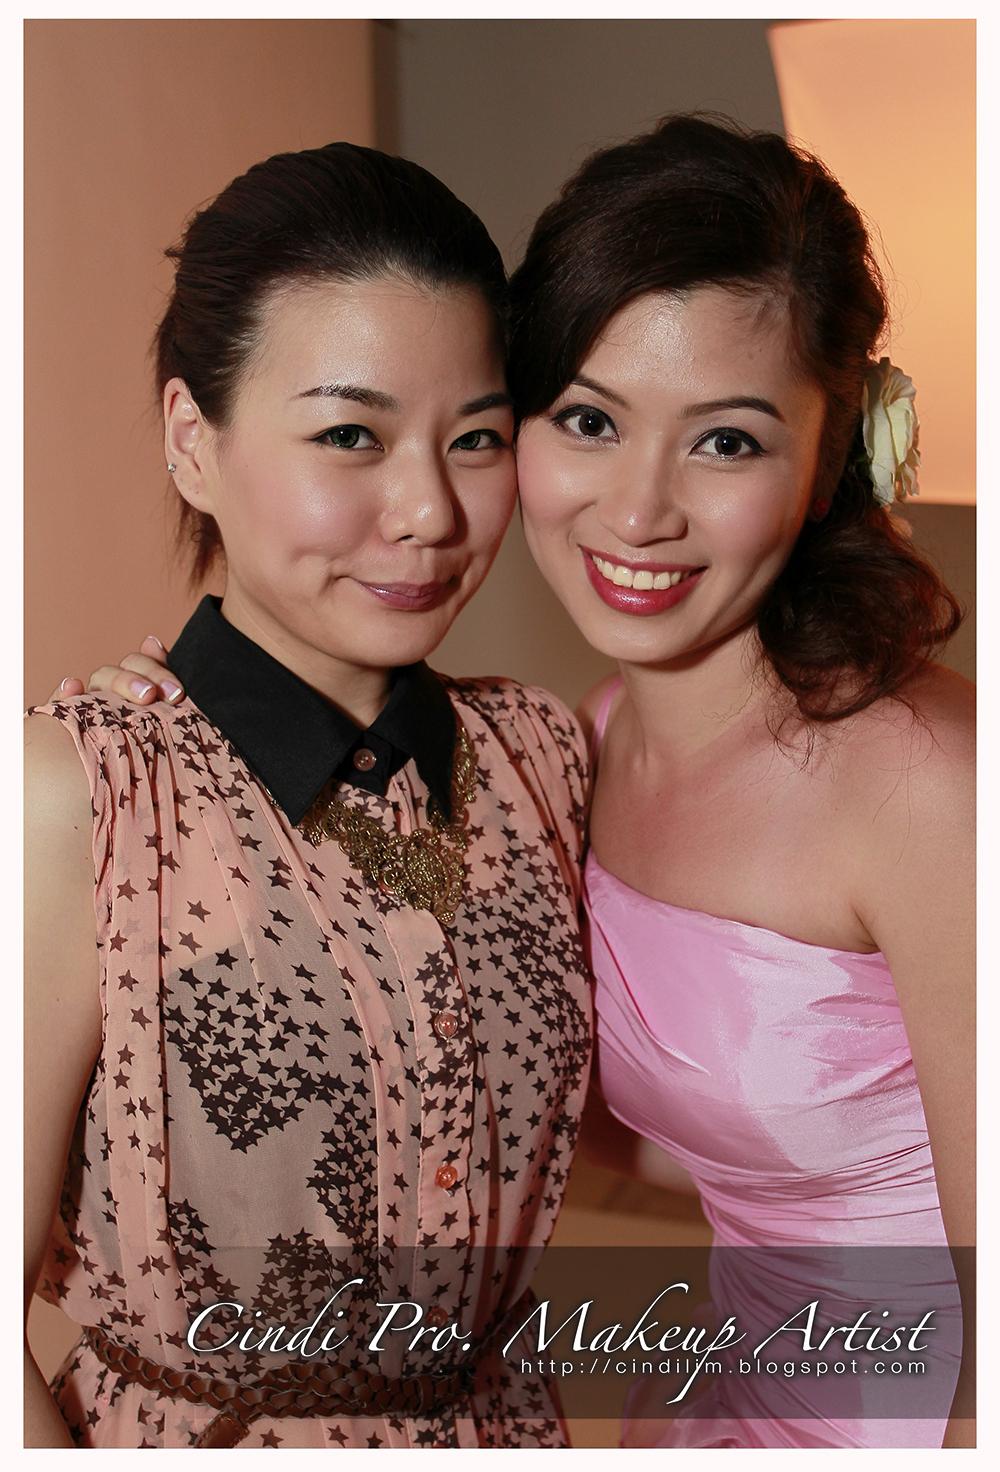 Cindi Pro Makeup Artist Commercial Photoshoot Makeup: :: Cindi Pro. Makeup Artist ::: Pre-wedding Miss Khaw S.L